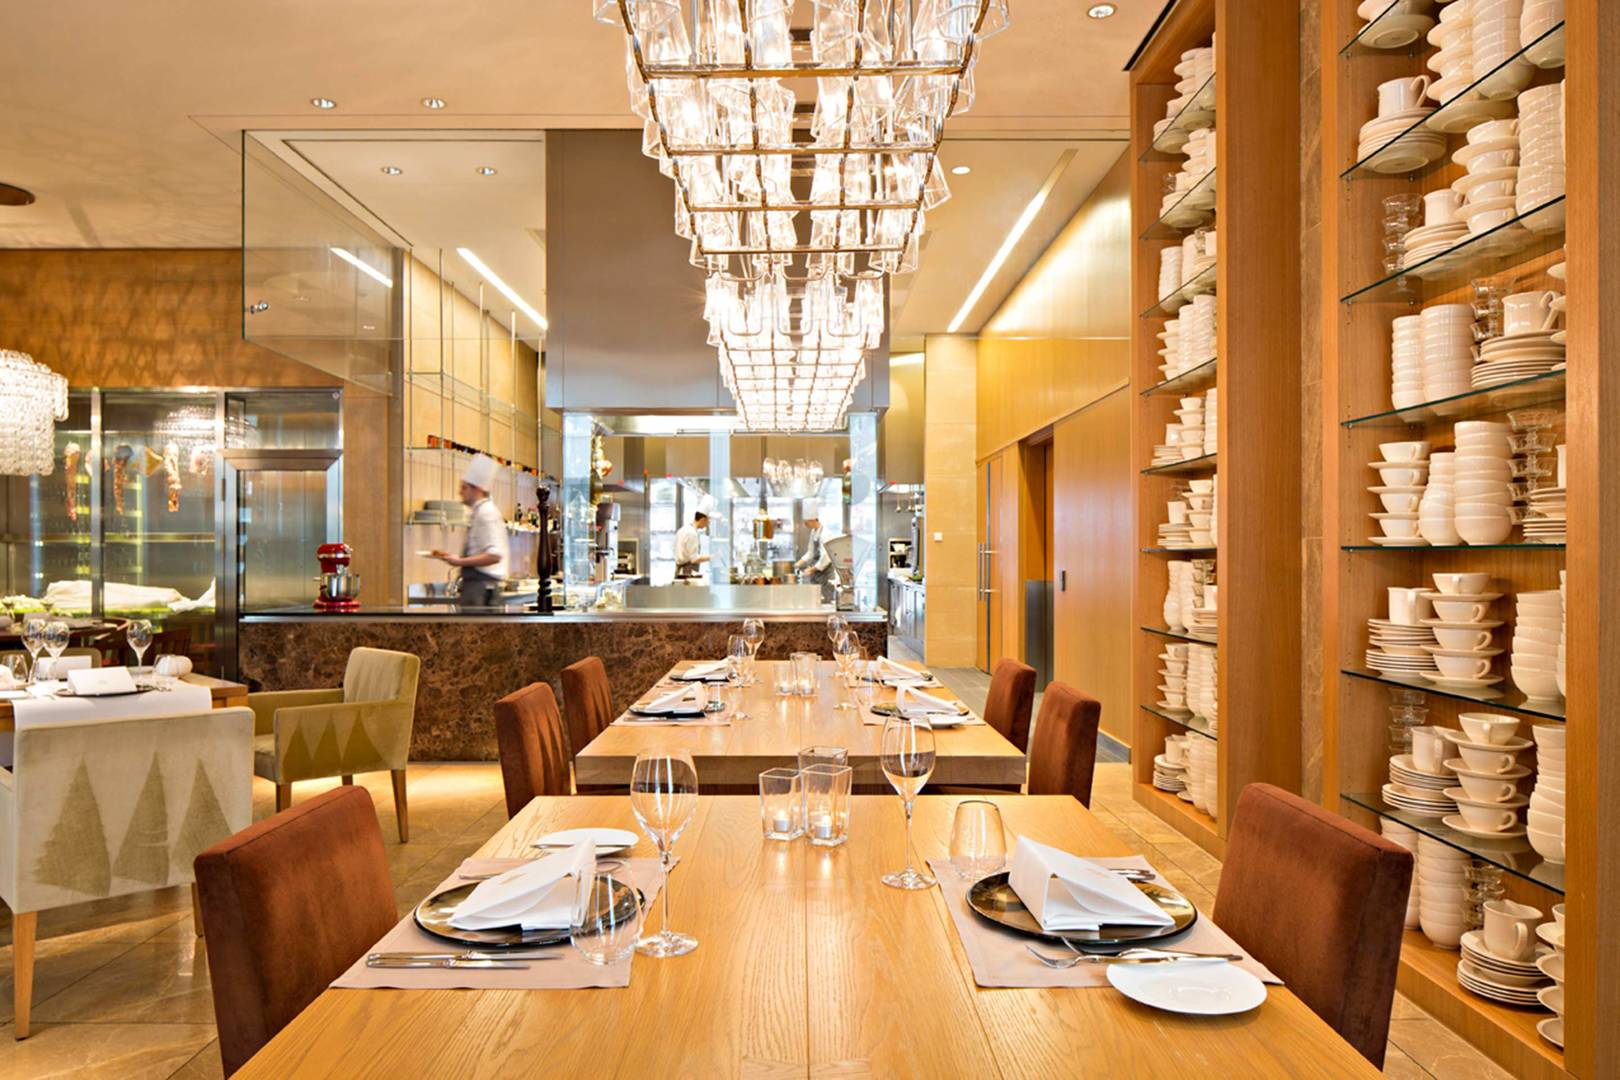 https://cdn.jumeirah.com/-/mediadh/DH/Hospitality/Jumeirah/Restaurants/Frankfurt/Frankfurt-Max-On-One-Grill-Room/Restaurant-Gallery/Jumeirah-Frankfurt-Max-on-One_6-4.jpg?h=1080&w=1620&hash=D2431E9BDF171F08191FA7C4D9D1D475